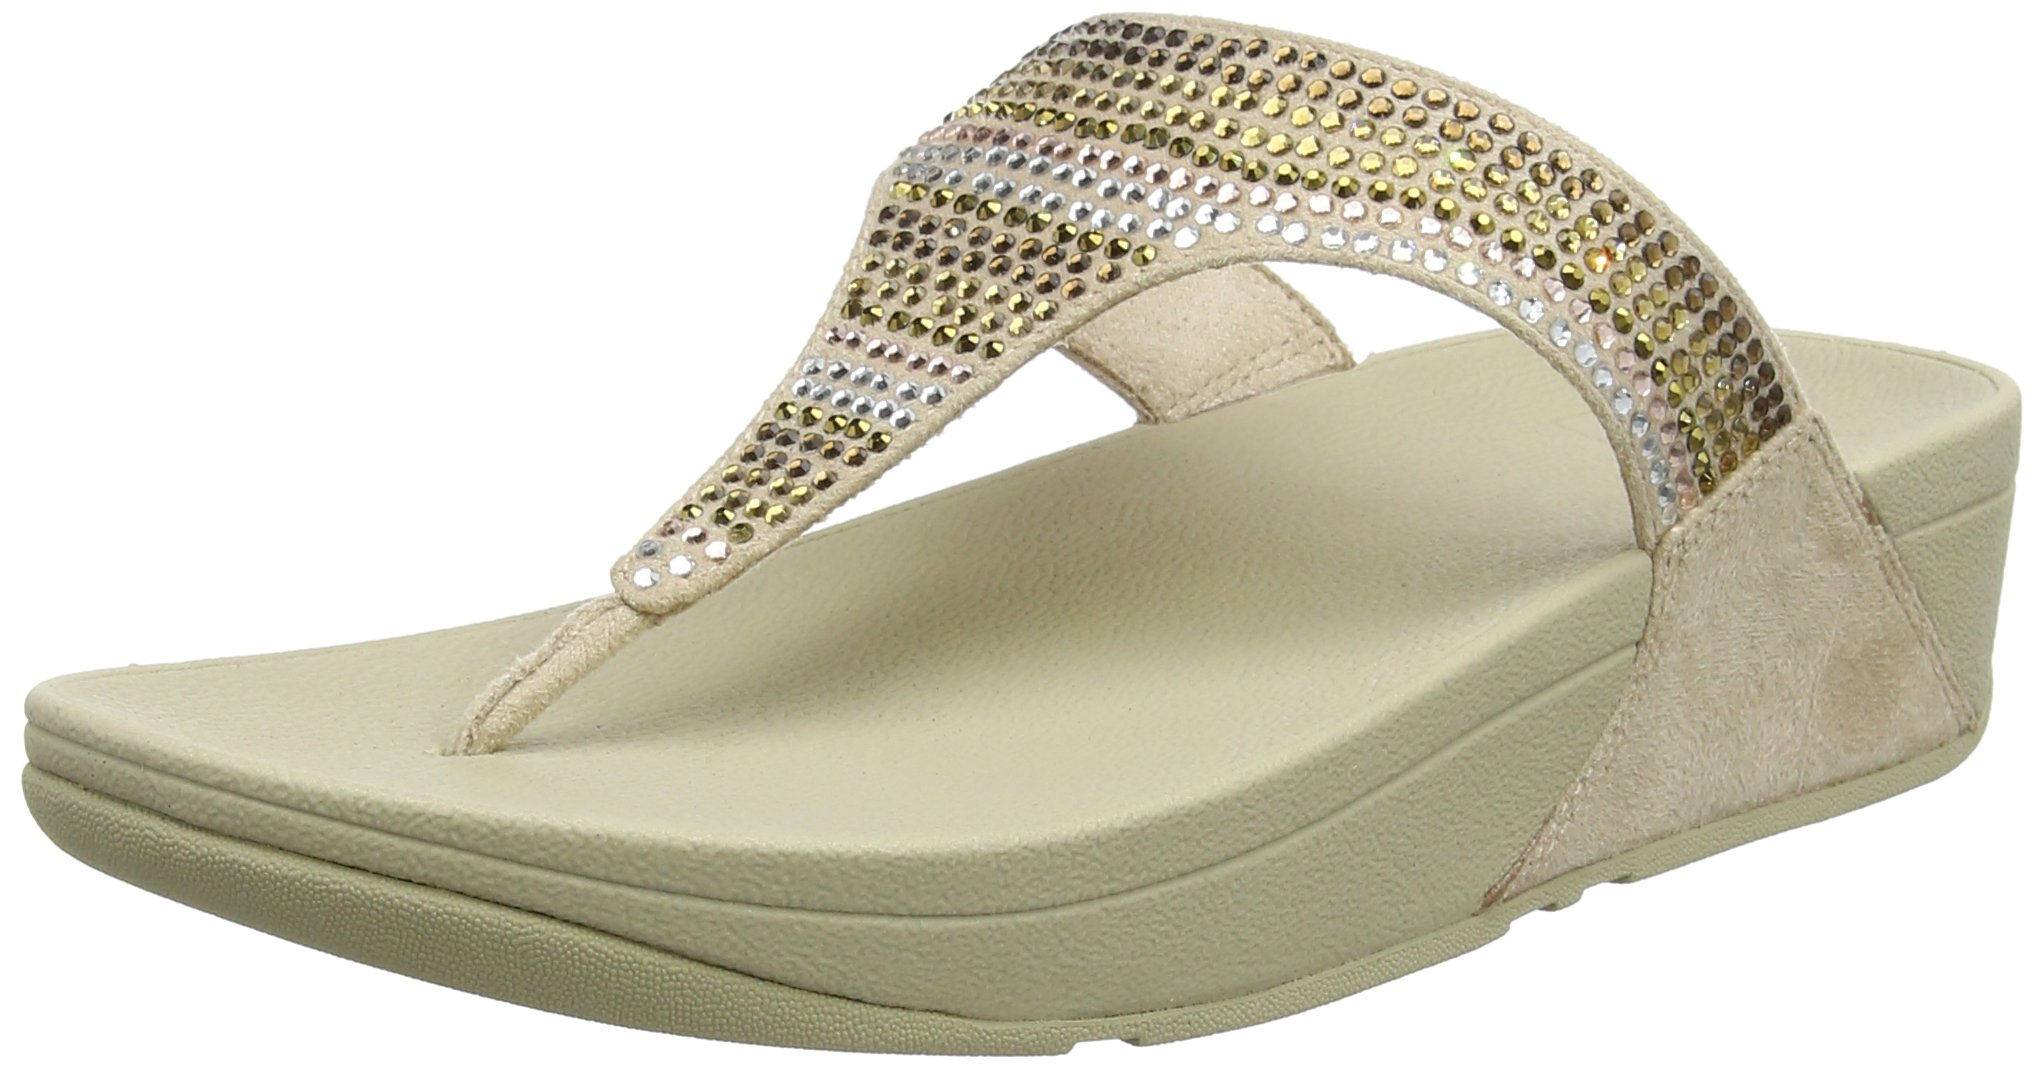 Ouvert 1042 Strobe thong Fitflop SandalsBout Eu Toe FemmeOrgold dxoWrCBe